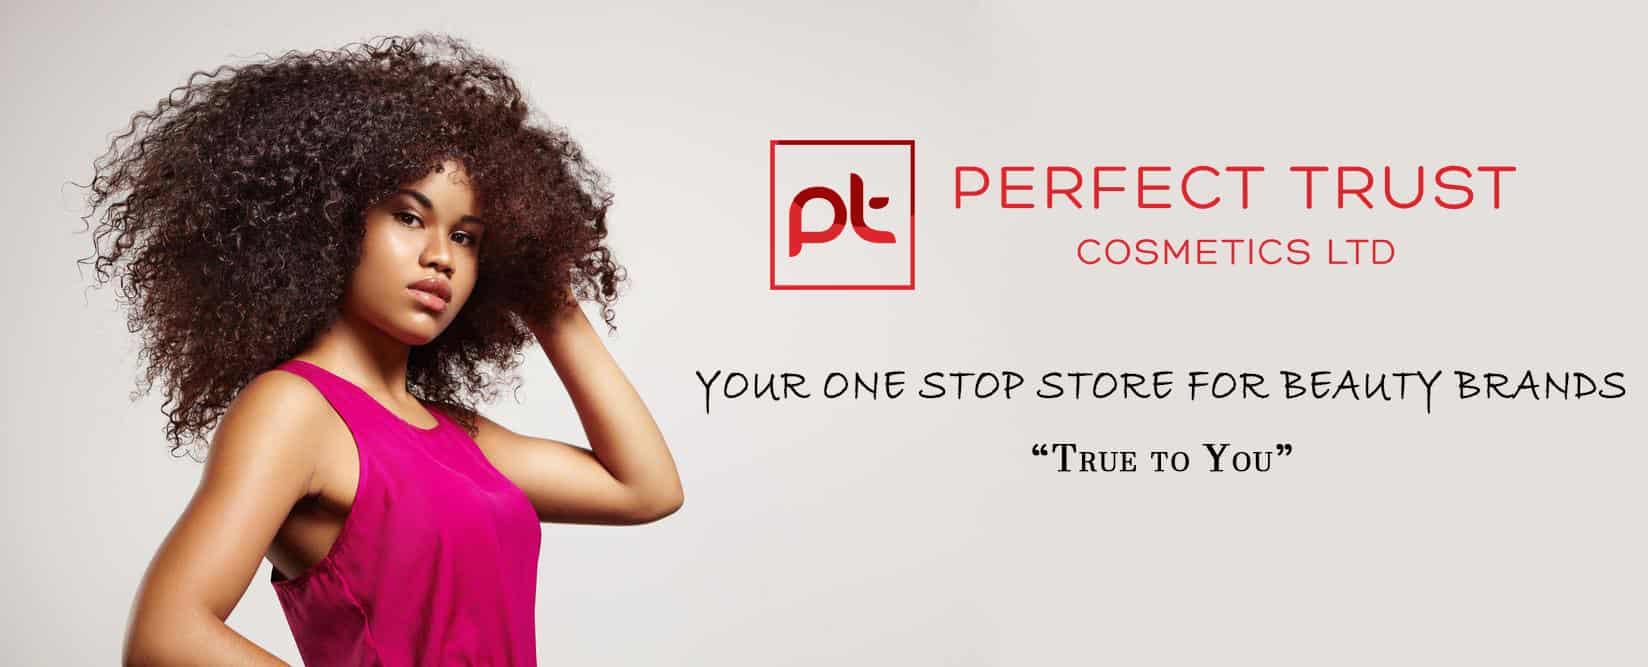 pt-cosmetics-03